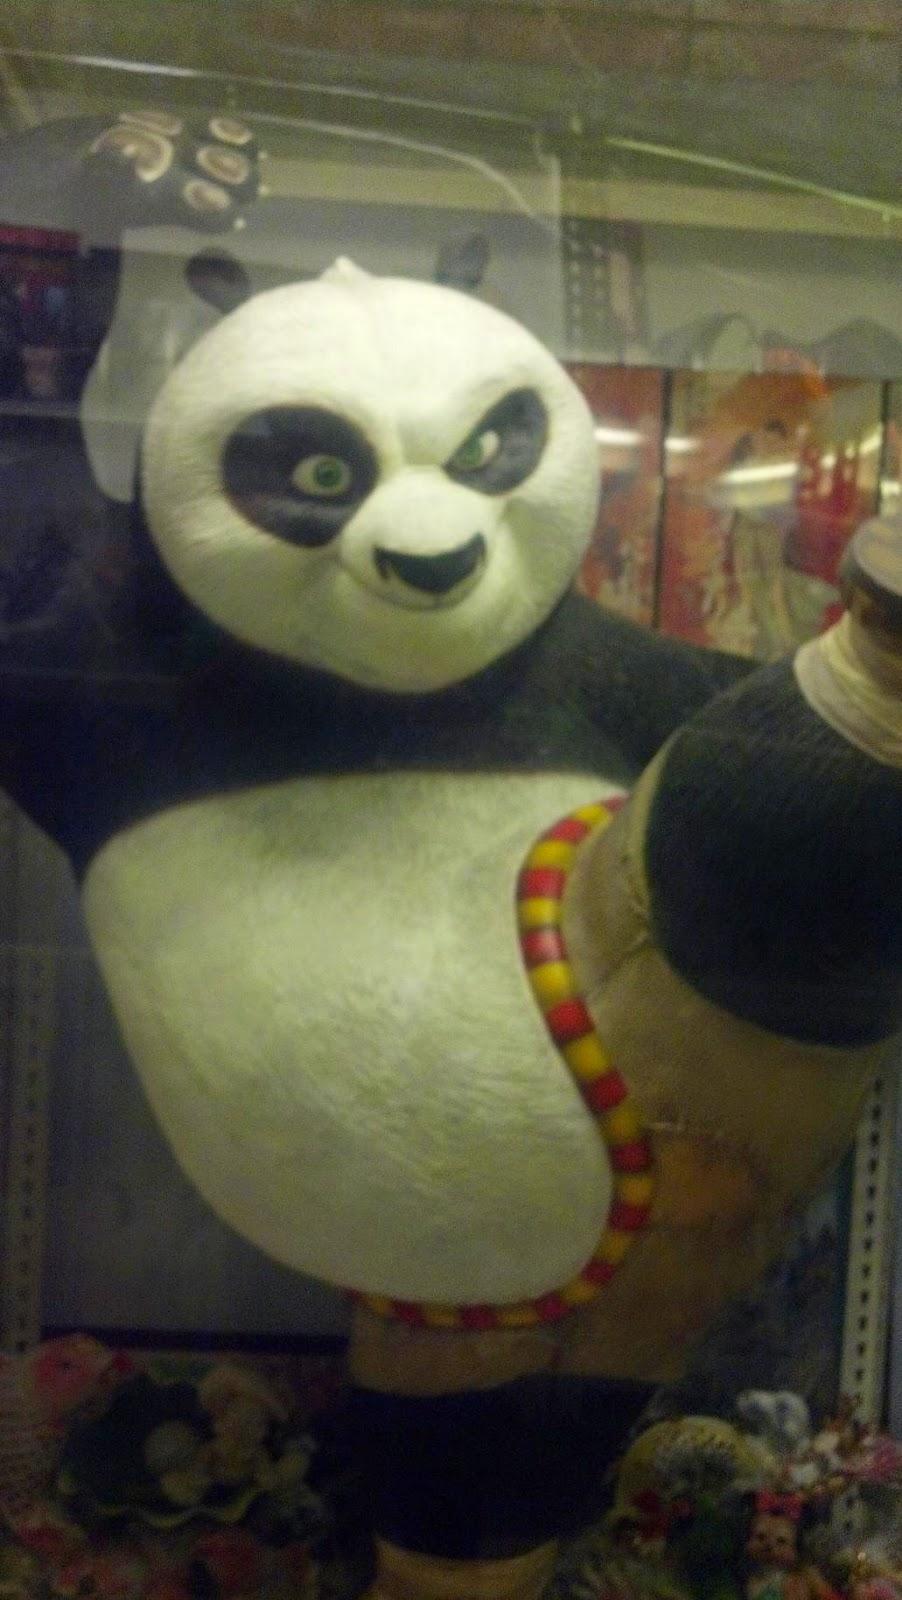 penang toy museum,muzium mainan teluk bahang